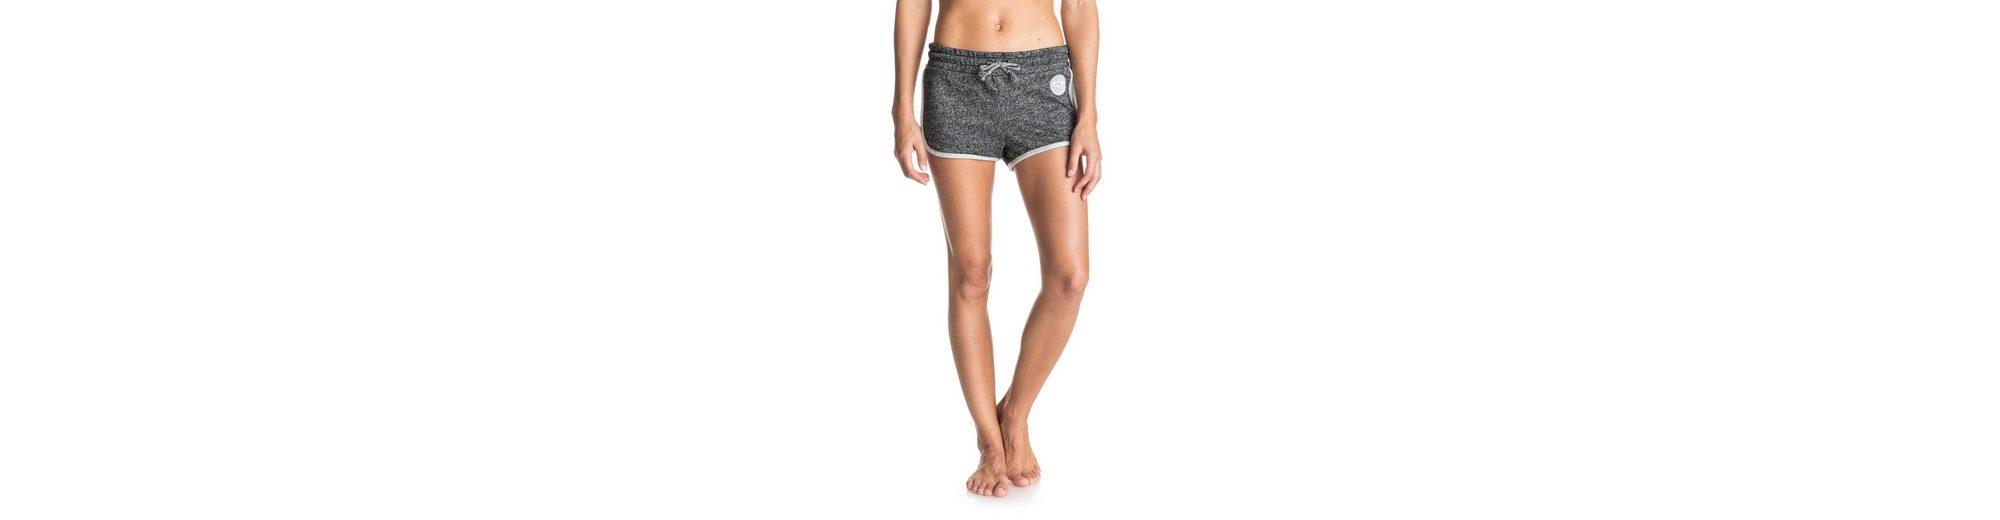 Roxy Dolphin-Shorts Late Dance - Dolphin-Shorts